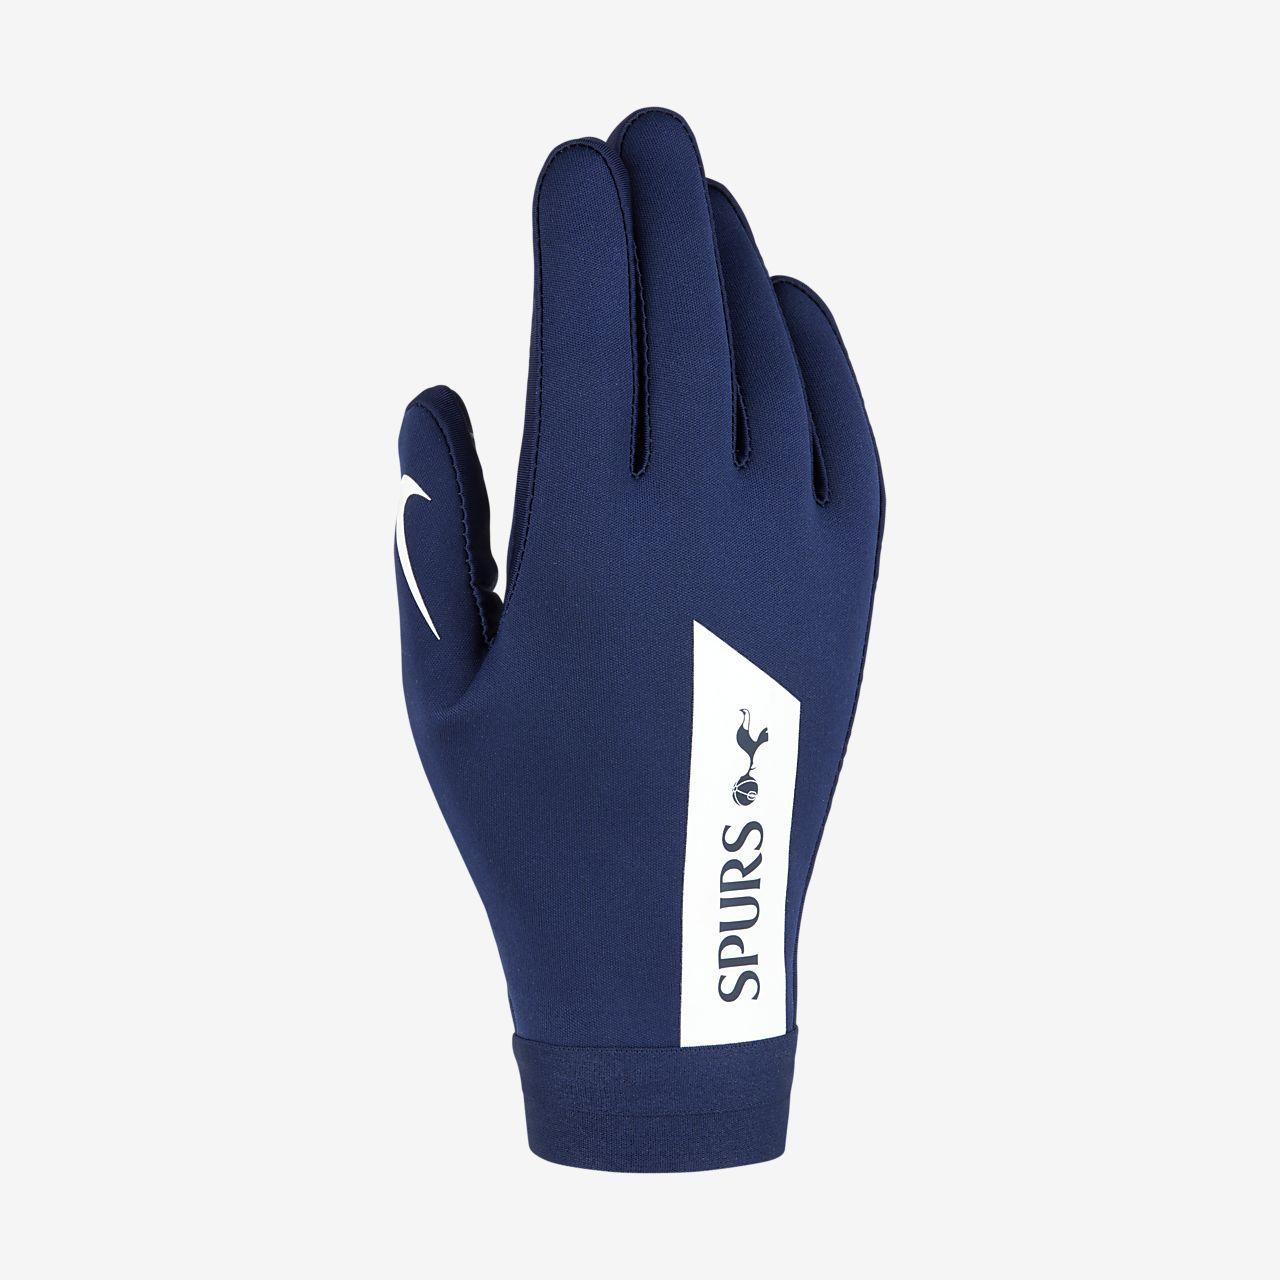 6b08386986b91 Nike HyperWarm Tottenham Hotspur Academy Football Gloves. Nike.com GB